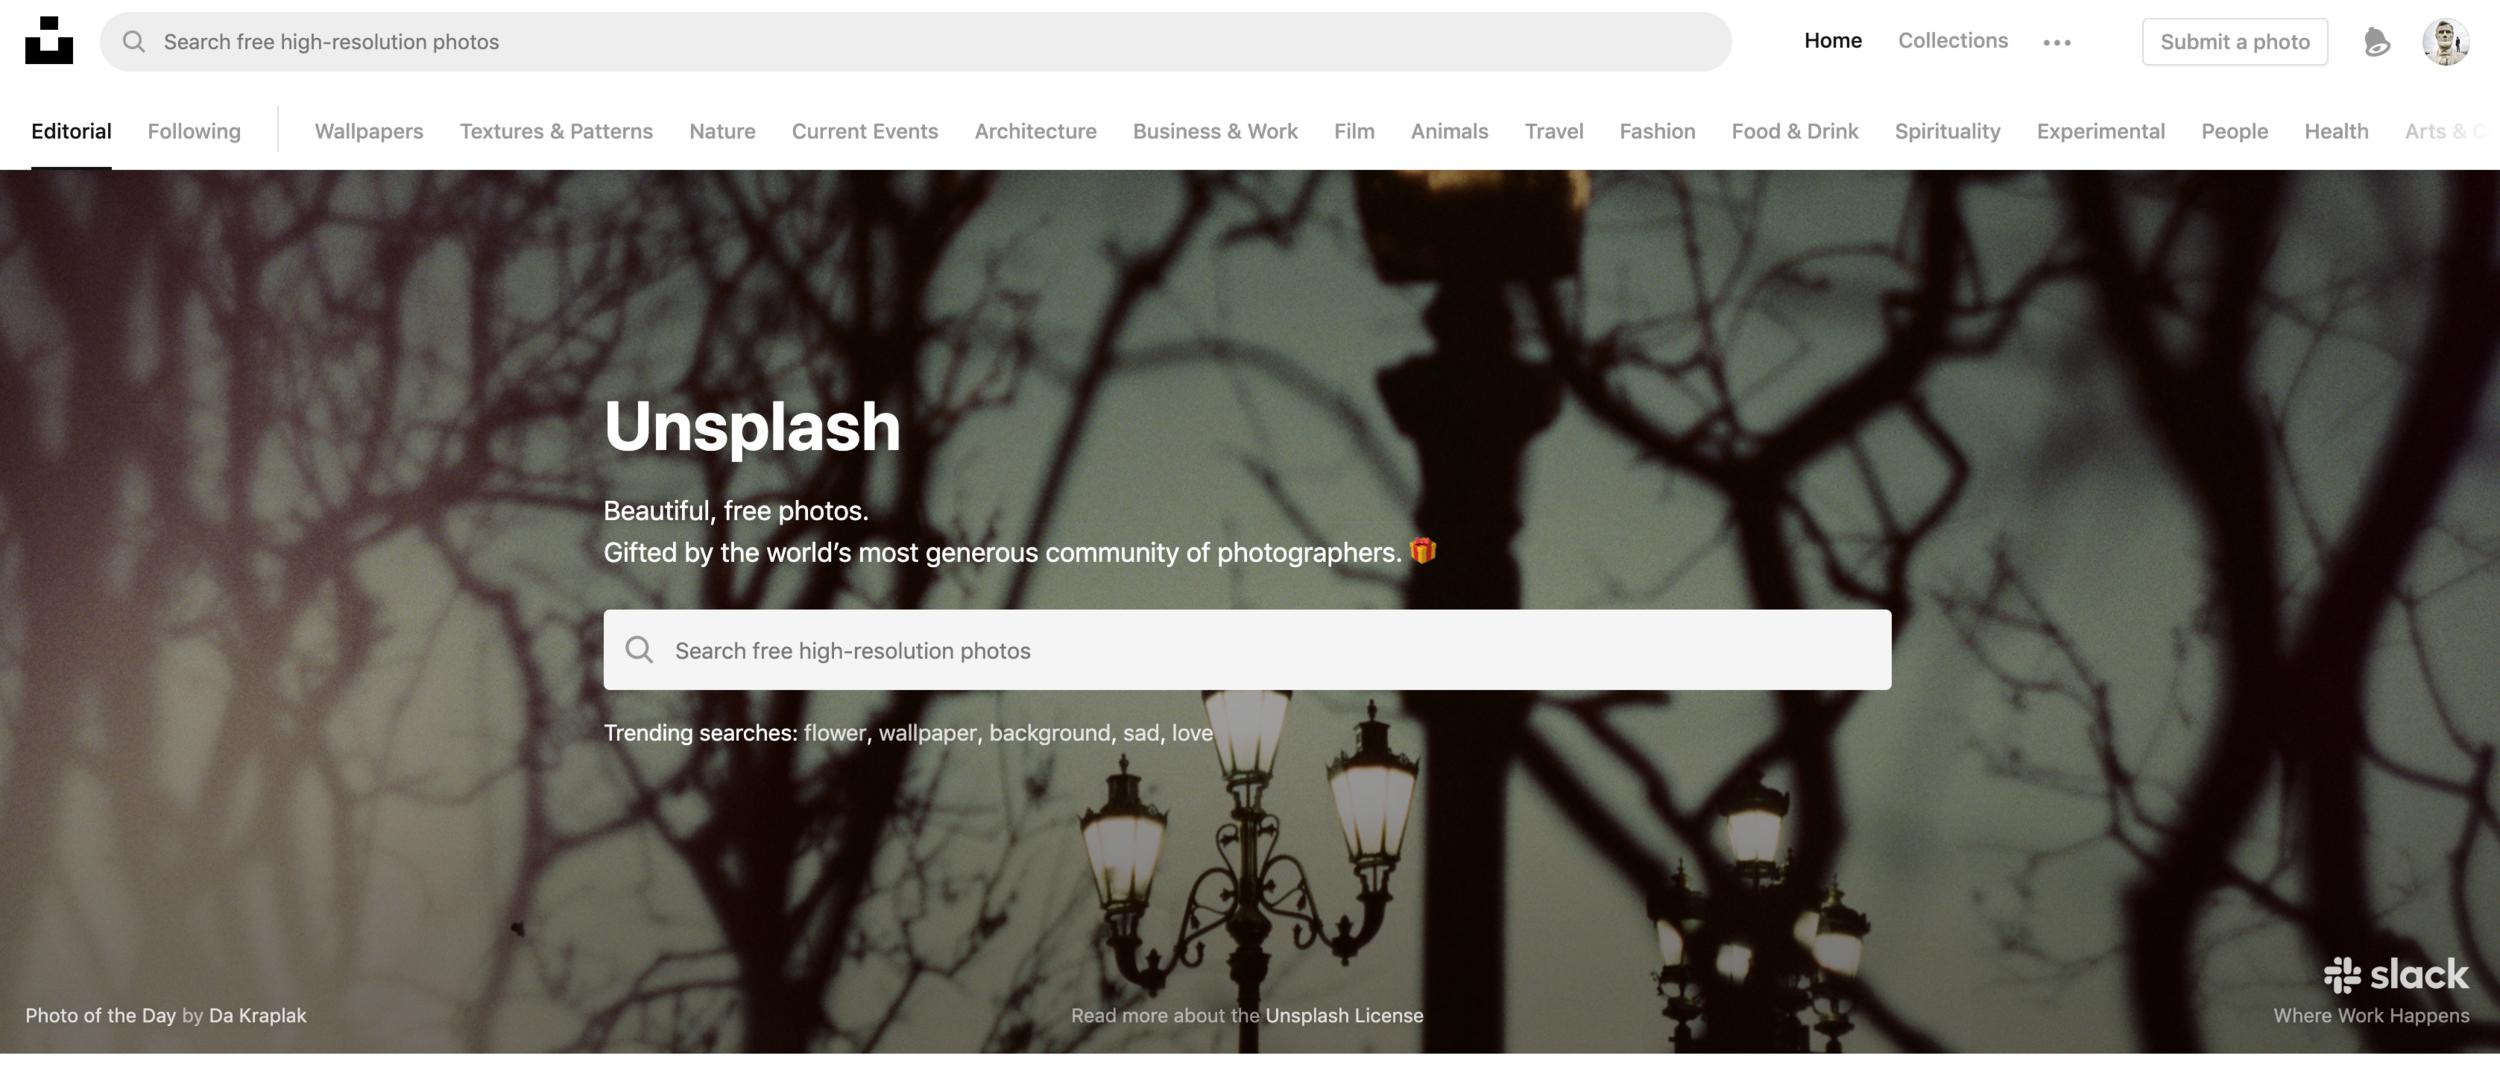 Unsplash.com Home Page.png